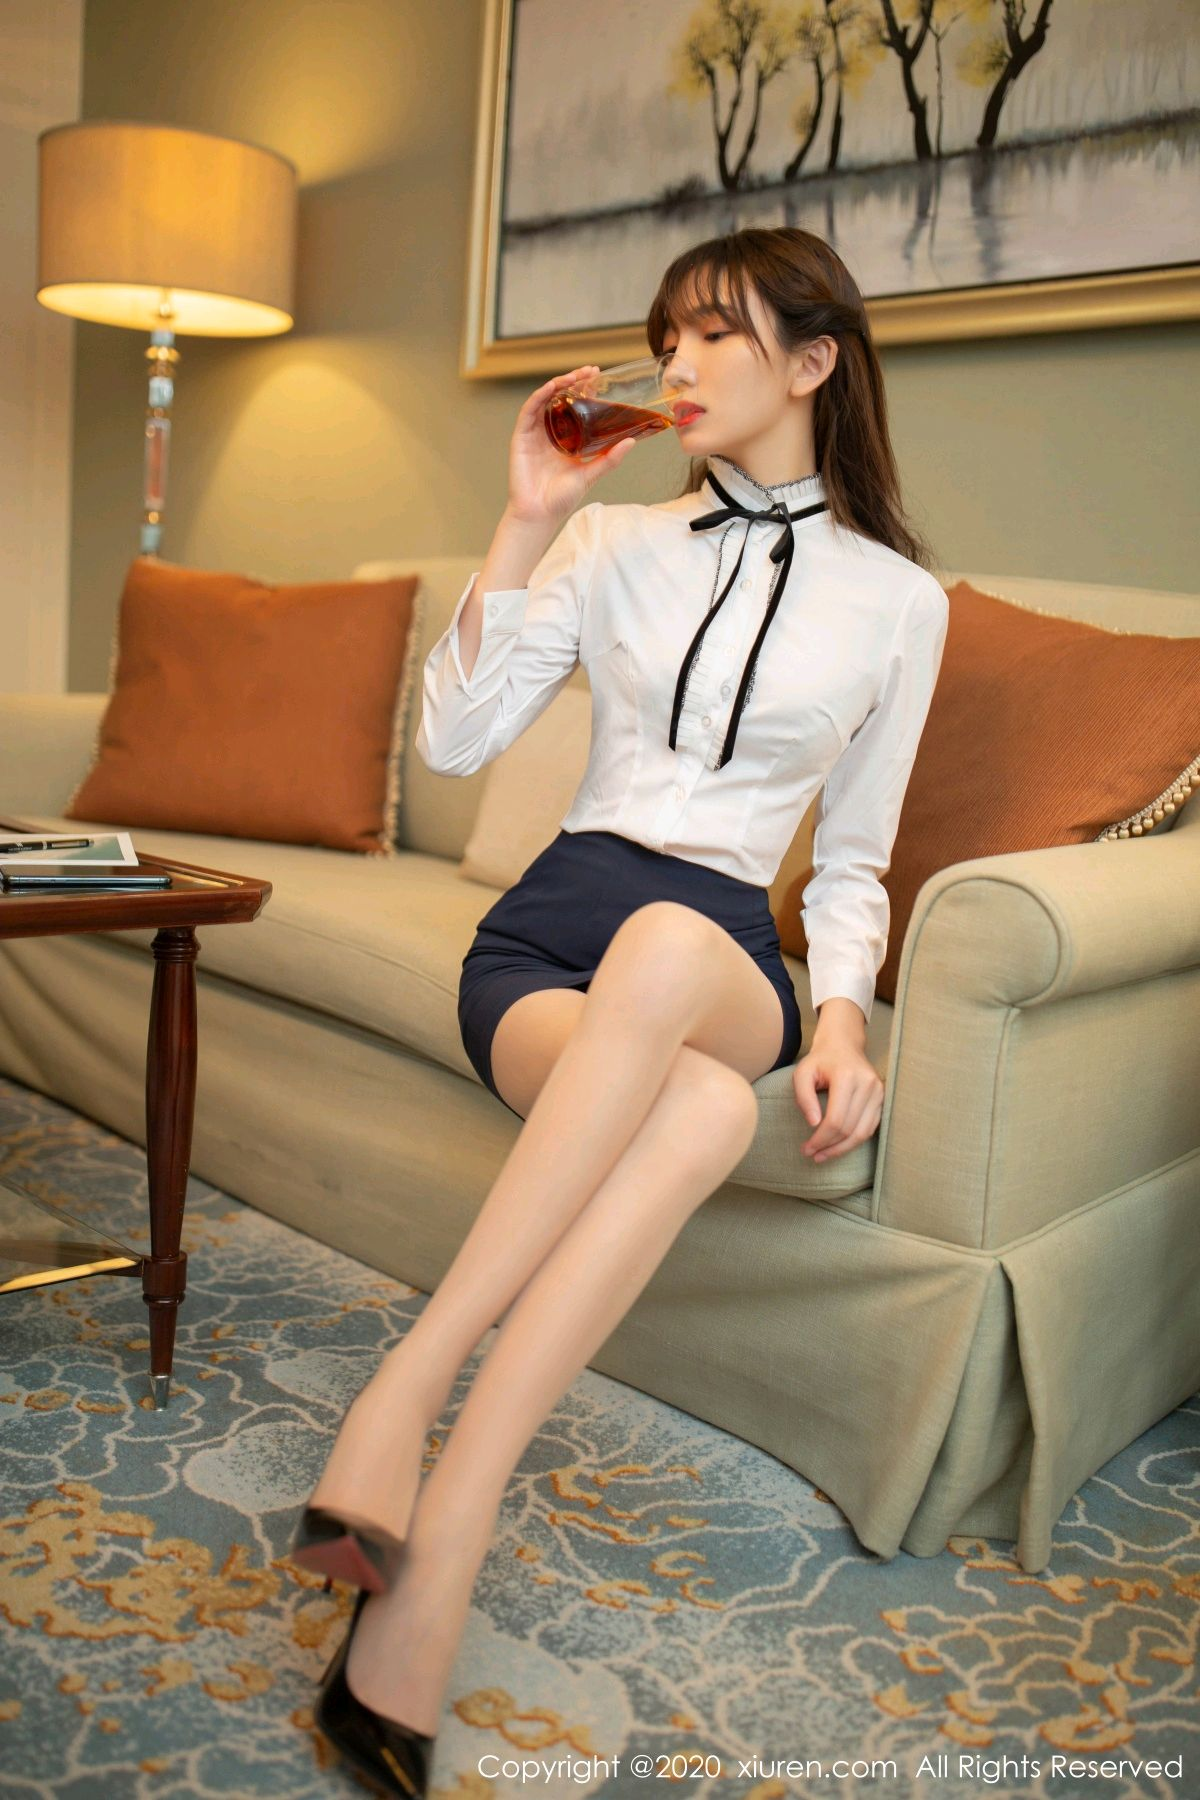 [XiuRen] Vol.2626 Secrets in mobile phones 8P, Chen Xiao Miao, Lu Xuan Xuan, School Uniform, Sisters, Xiuren